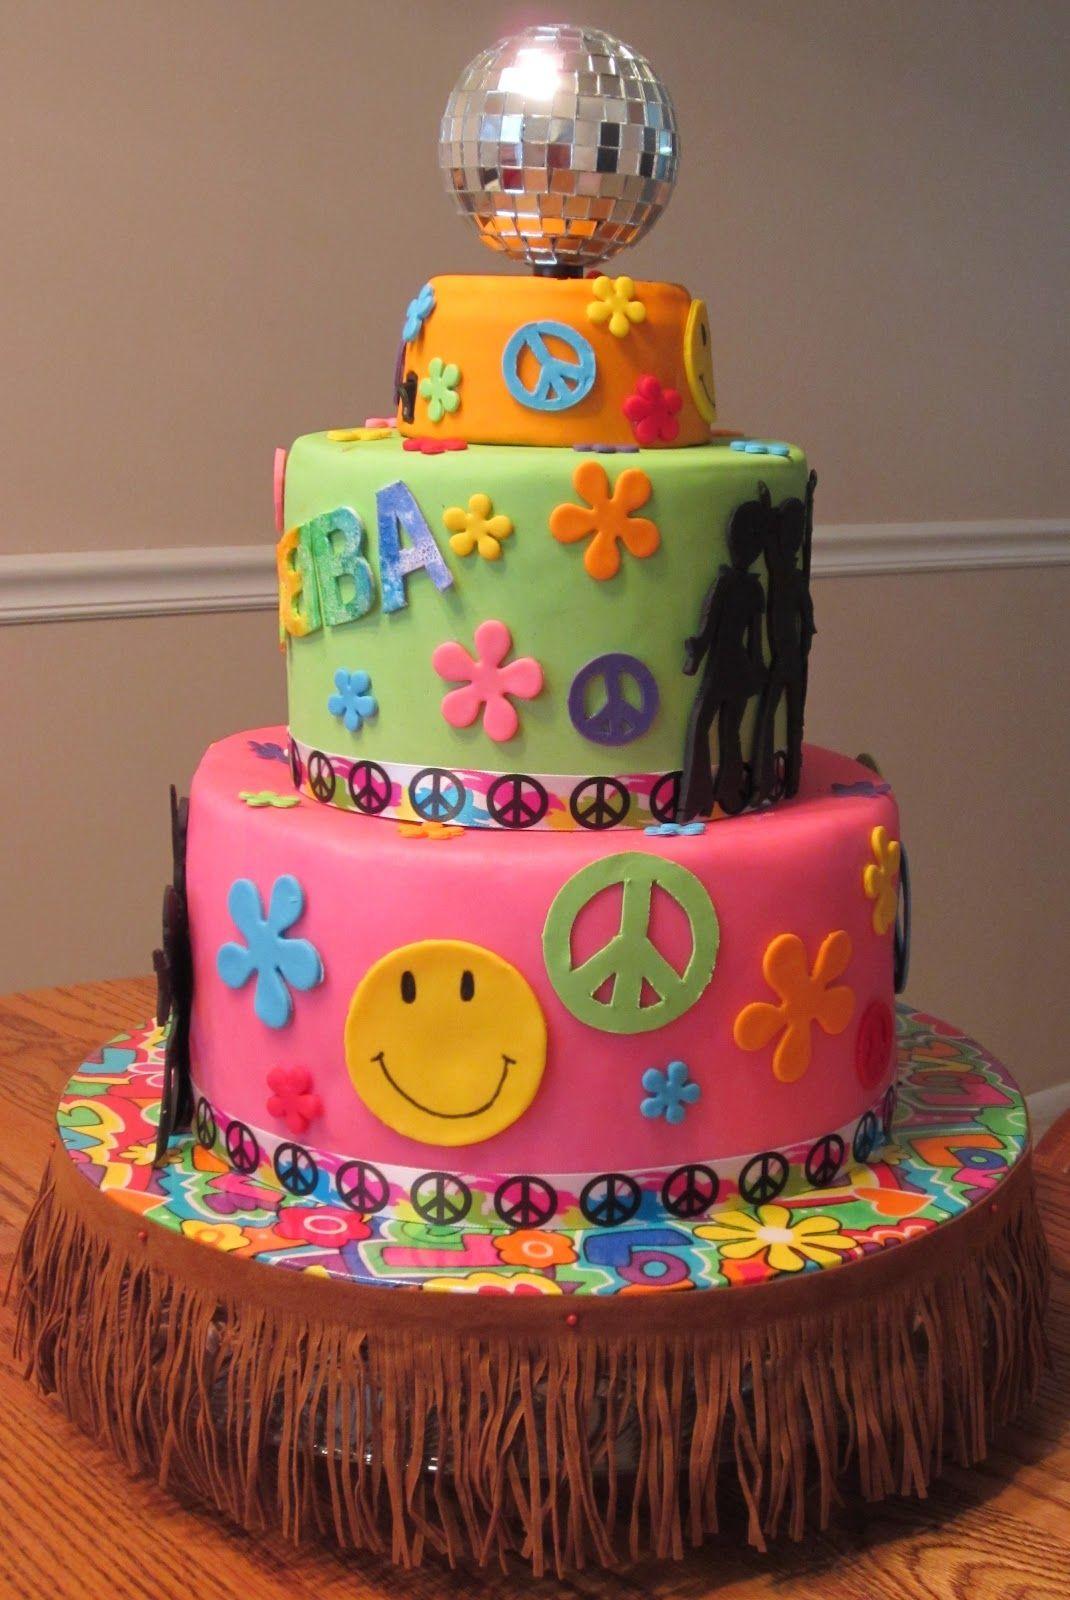 70s cake